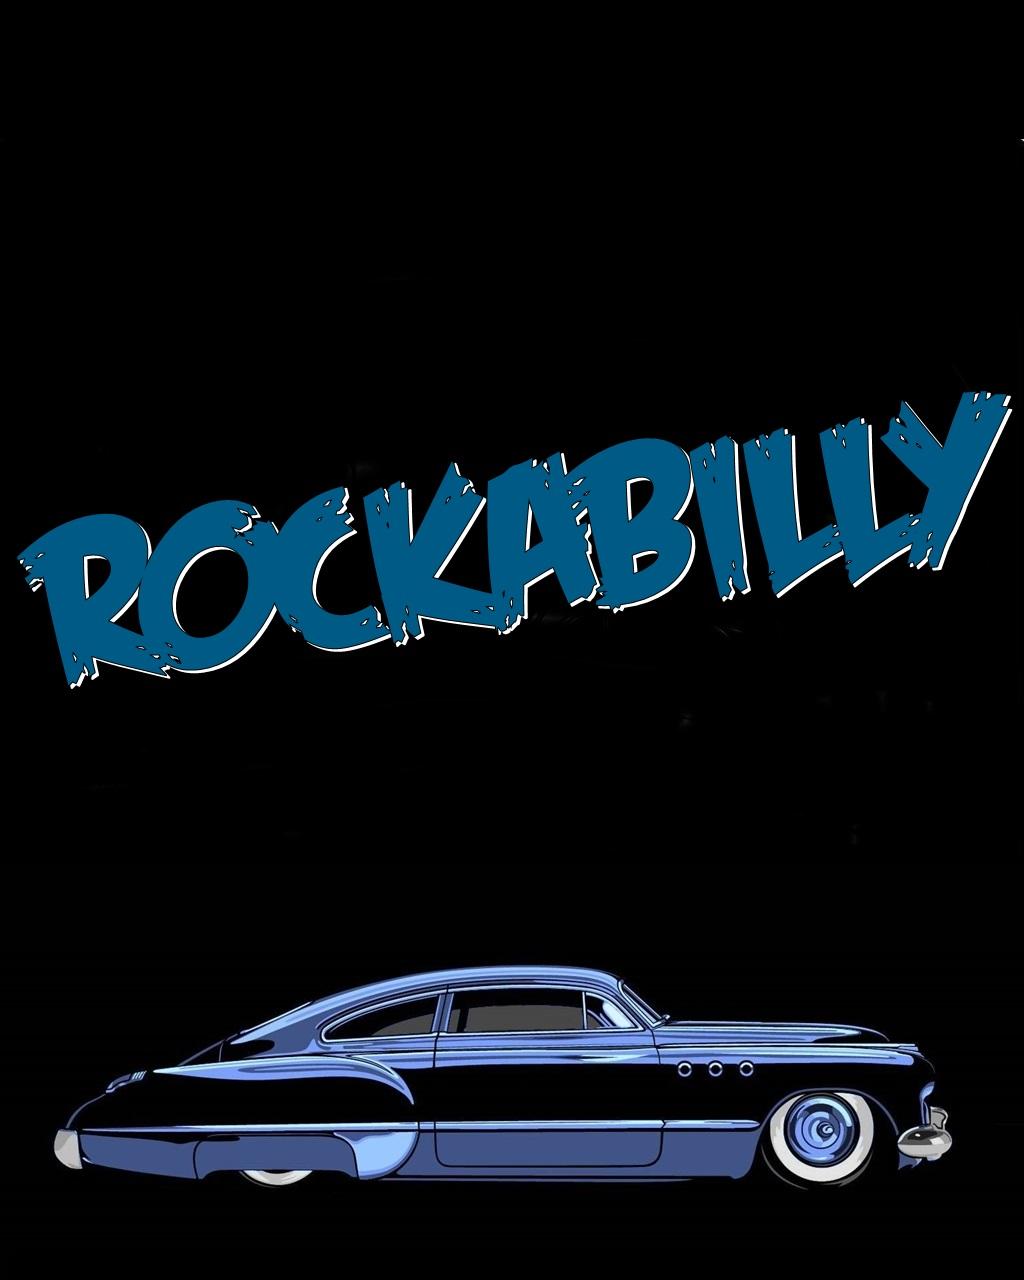 Rockabilly Wallpaper: Rockabilly By Pave65 On DeviantArt